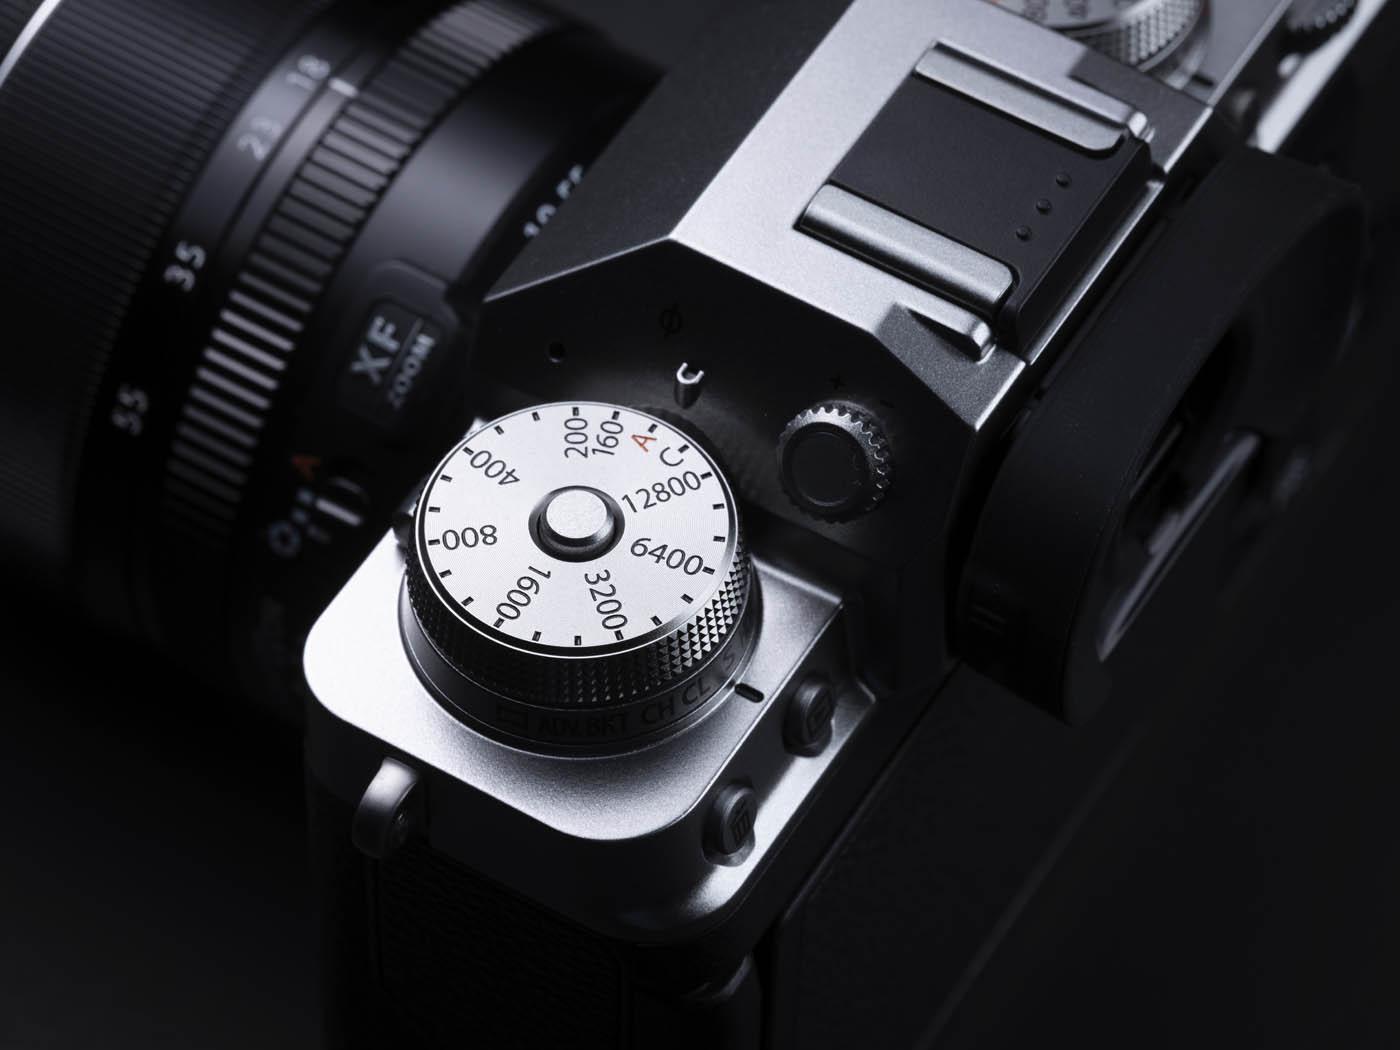 Fujifilm cover image